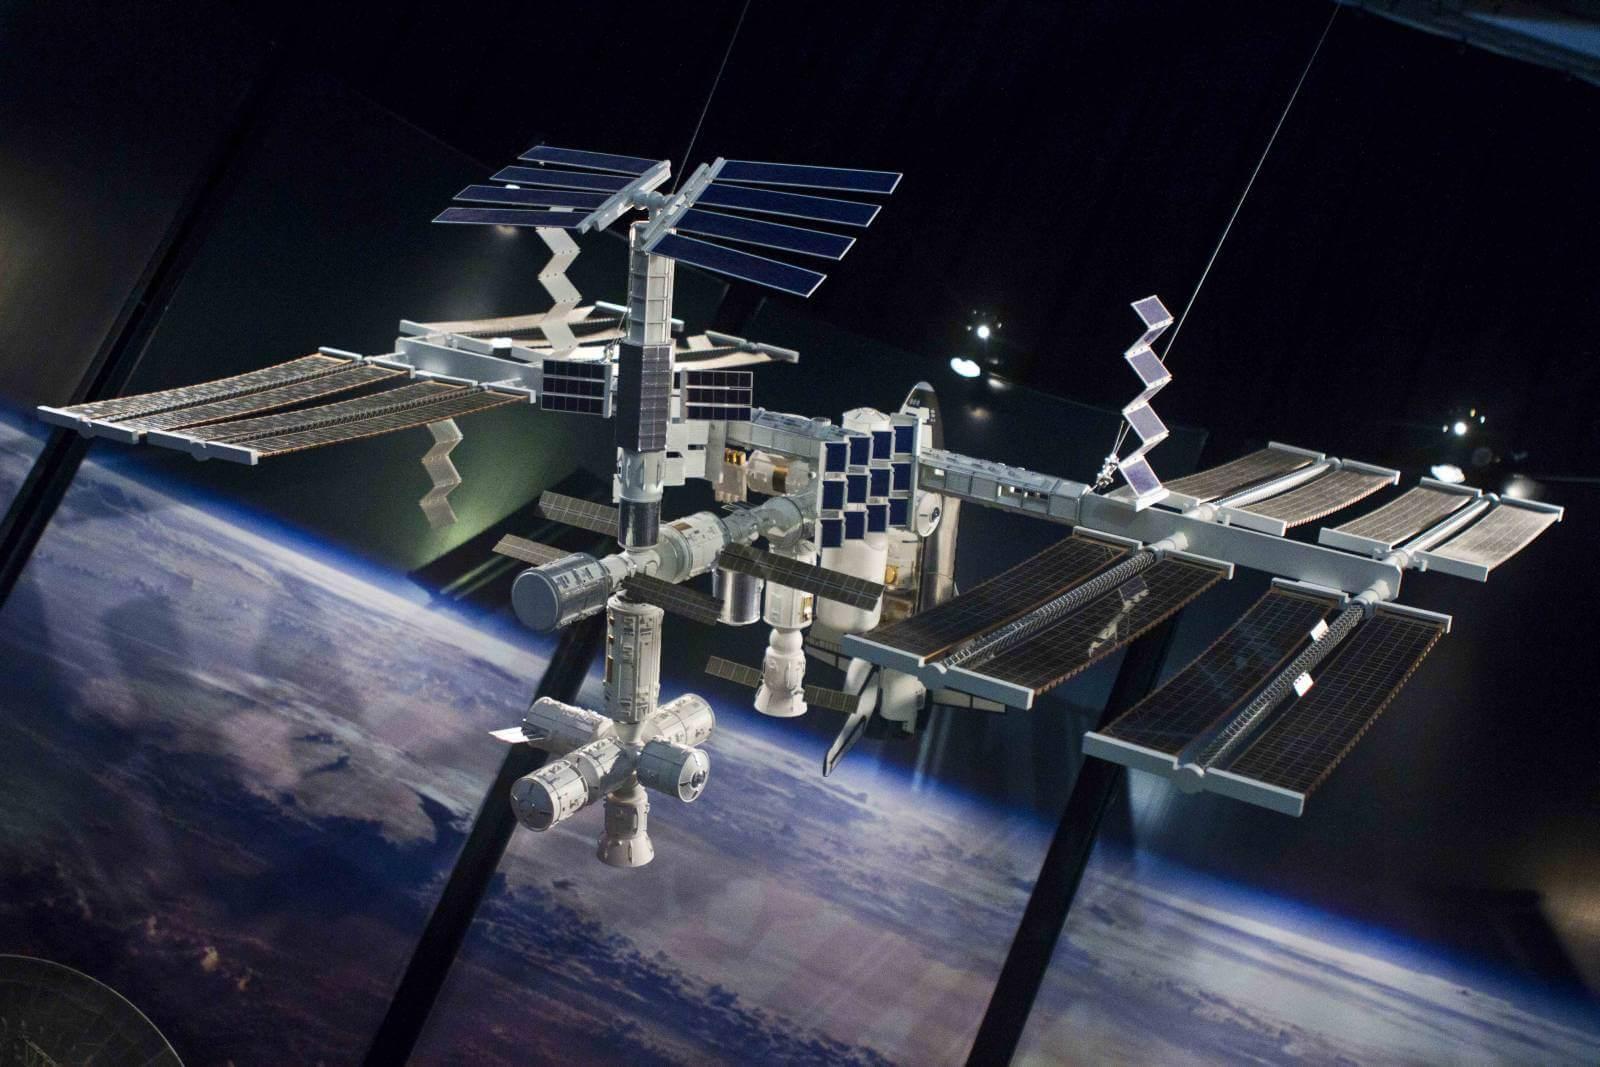 Mostra NASA - Stazione Spaziale Internazionale ISS